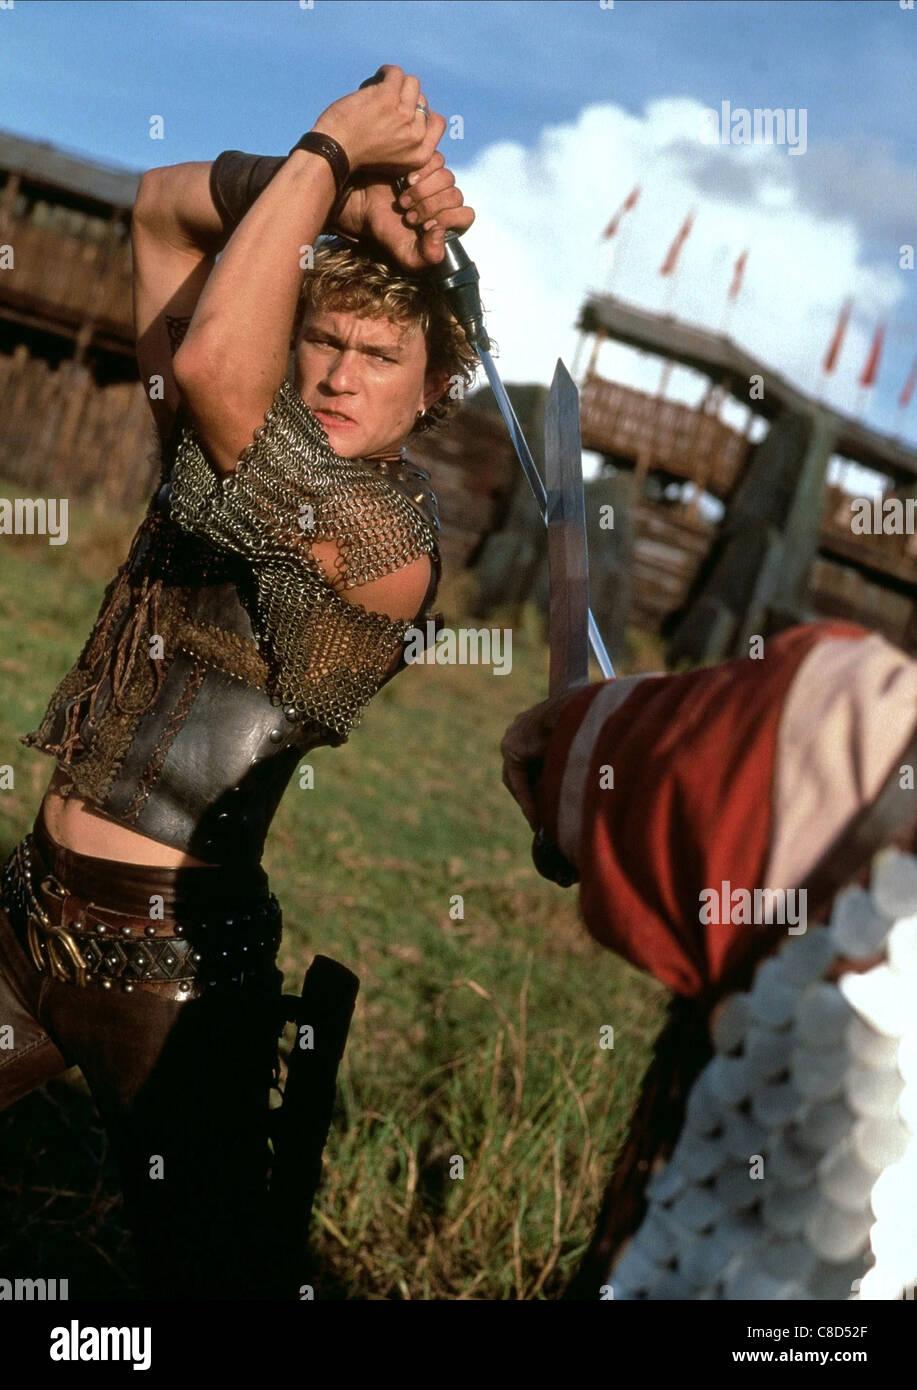 Heath Ledger Roar 1997 Stock Photo 39627351 Alamy